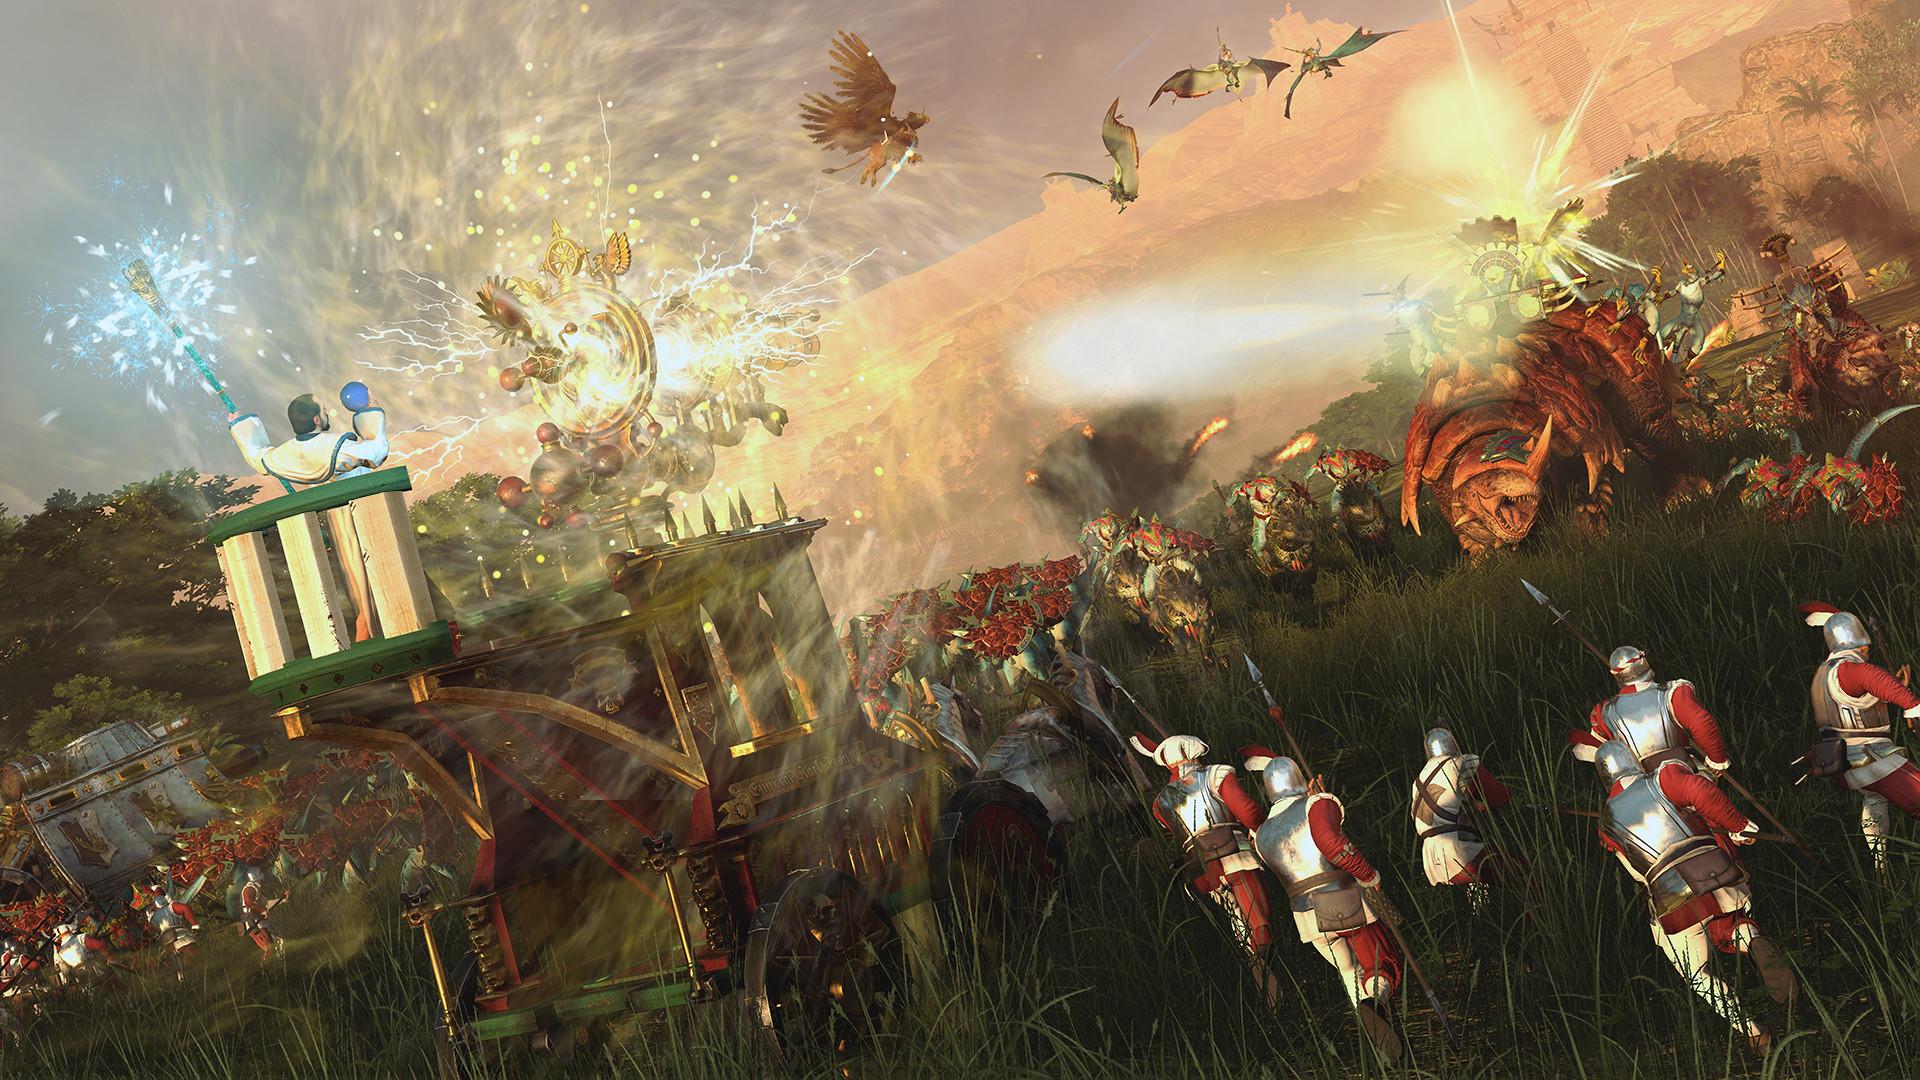 Total War: WARHAMMER II - Mortal Empires on Steam